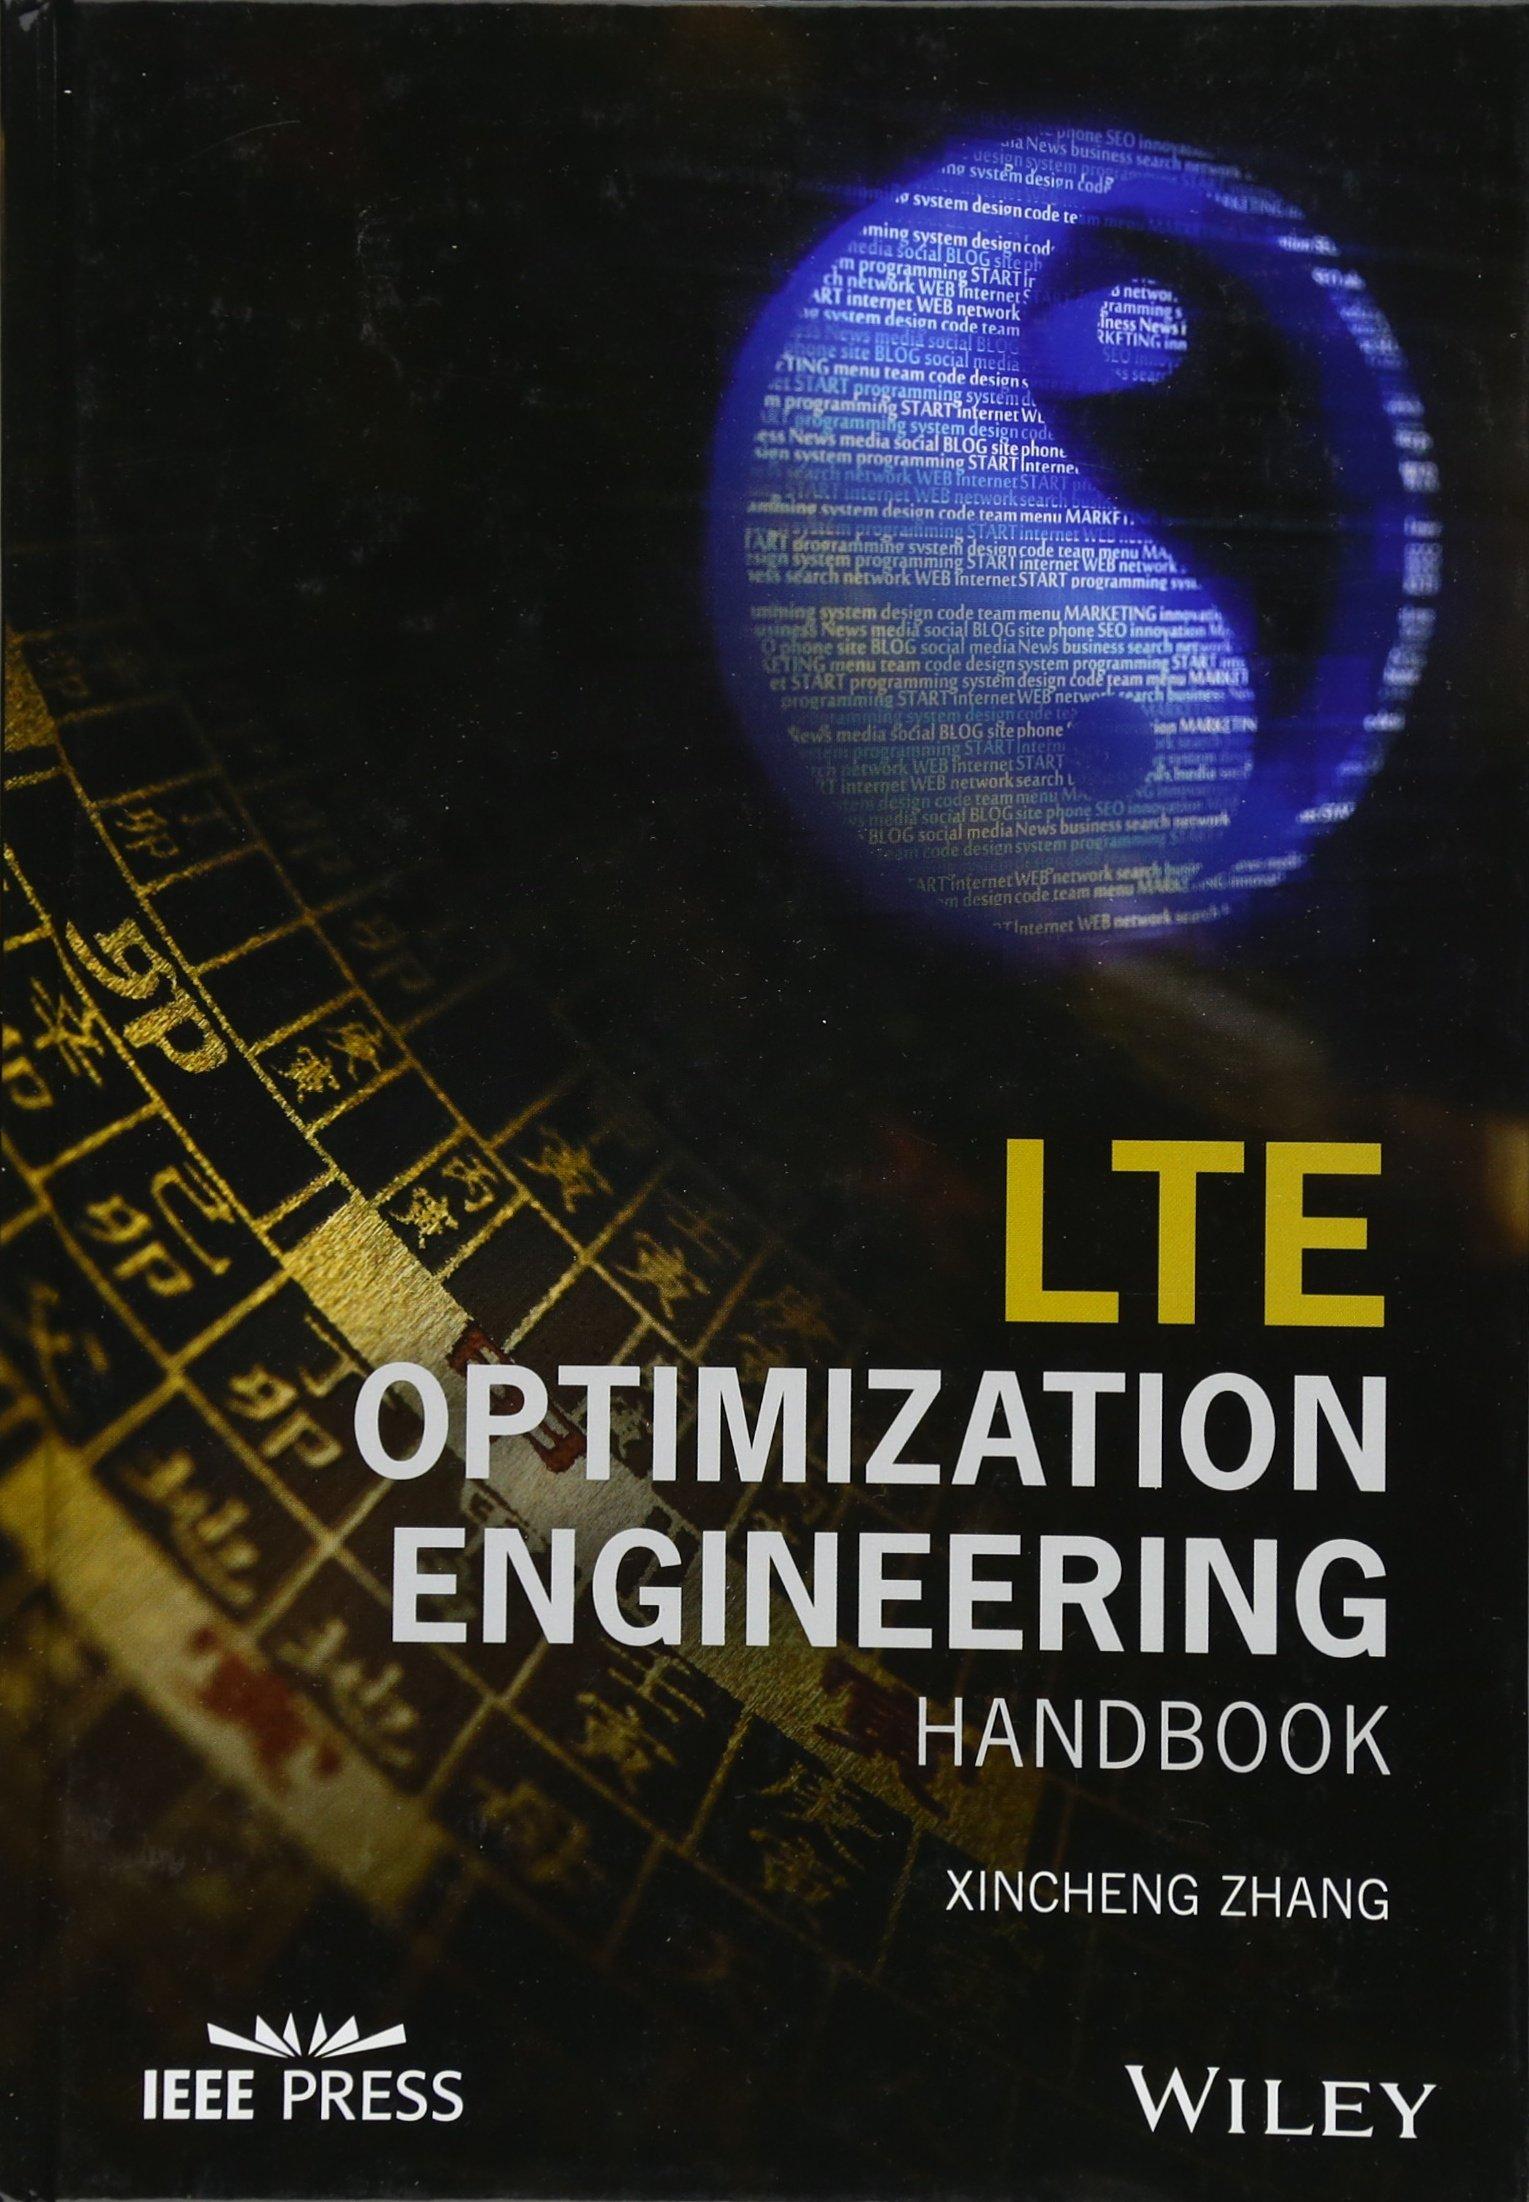 LTE Optimization Engineering Handbook